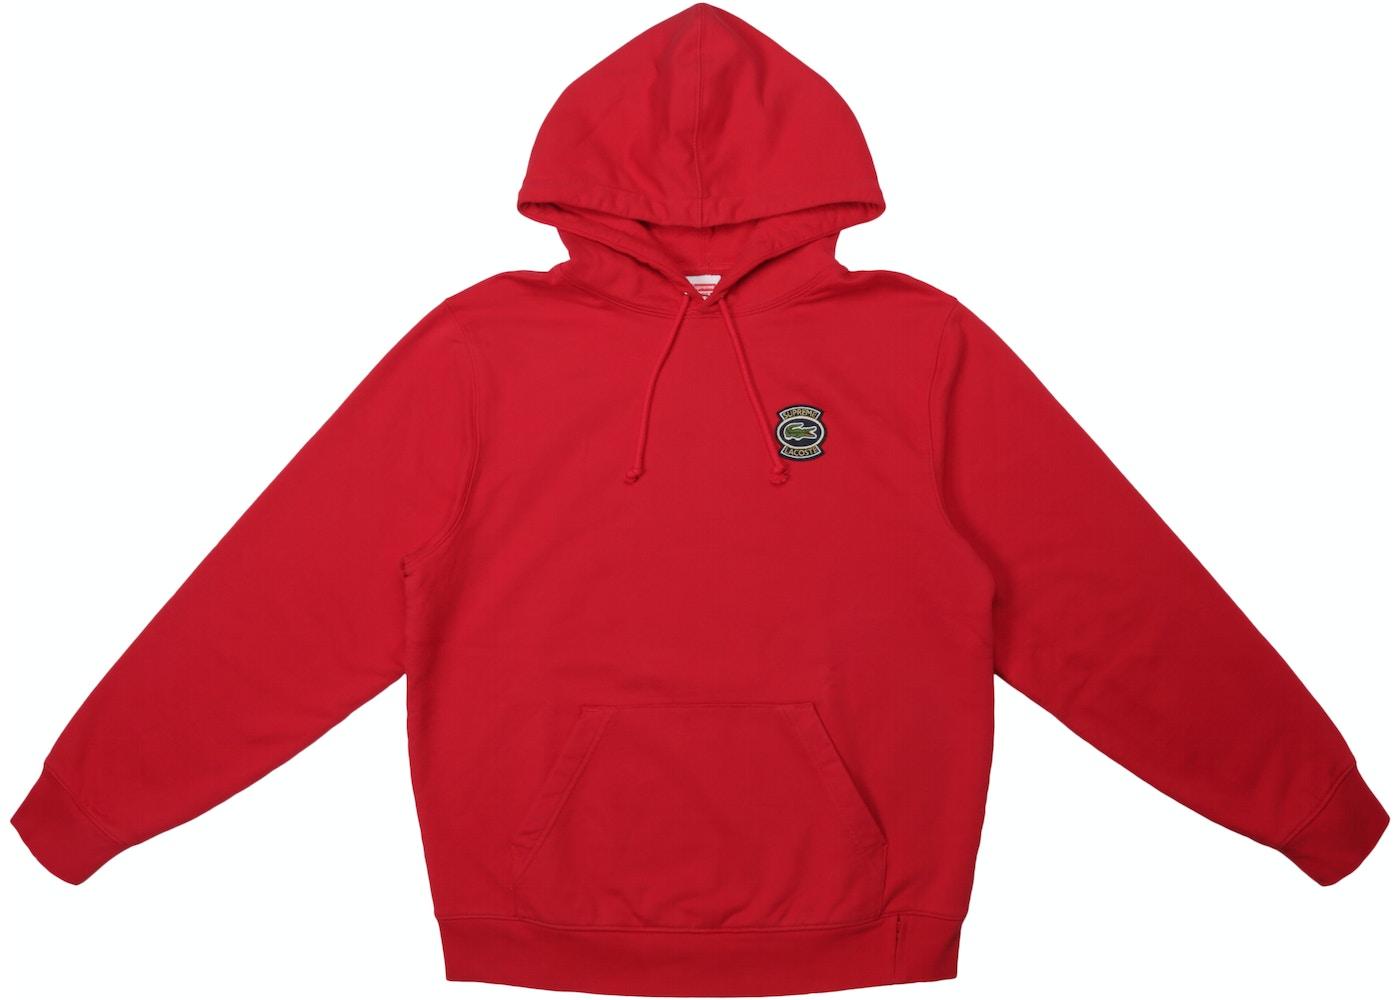 966ce11b Supreme LACOSTE Hooded Sweatshirt Red